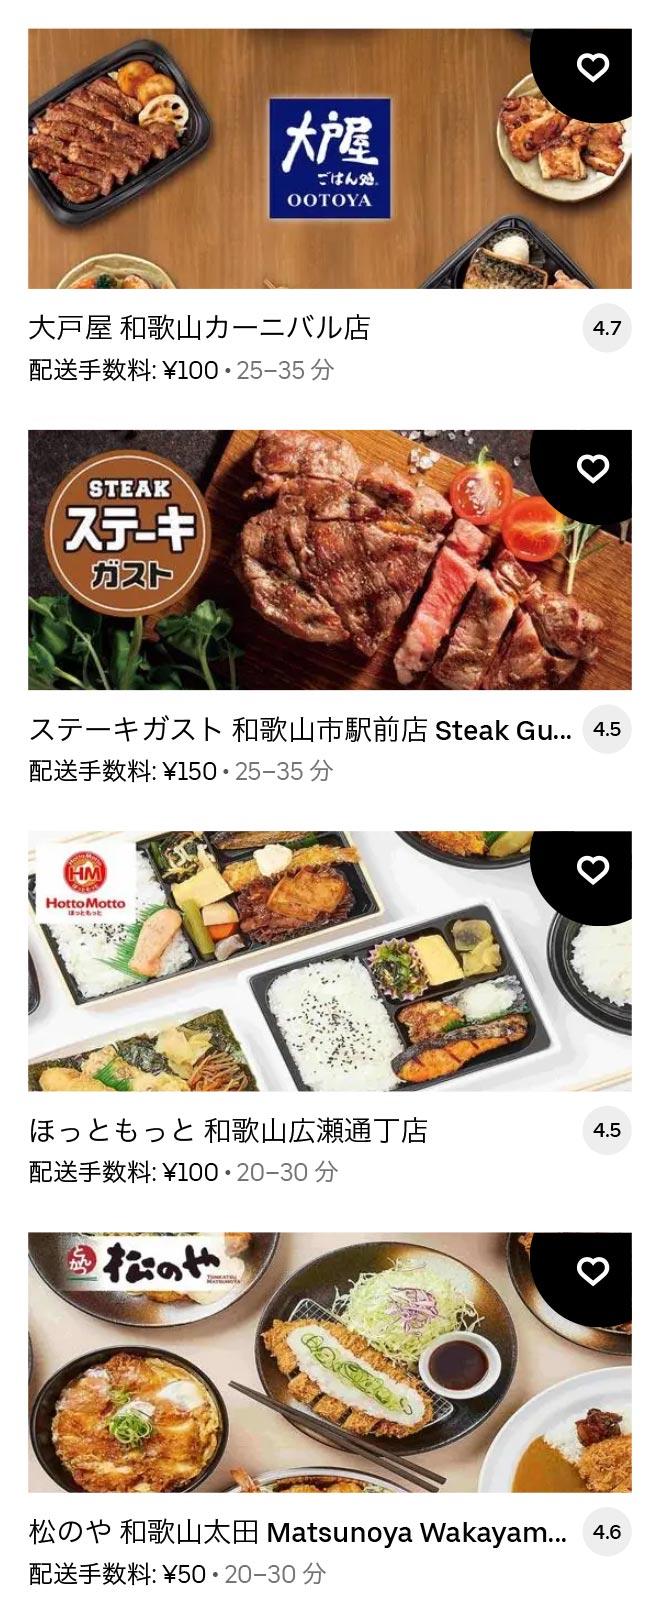 U wakayama menu 2104 04